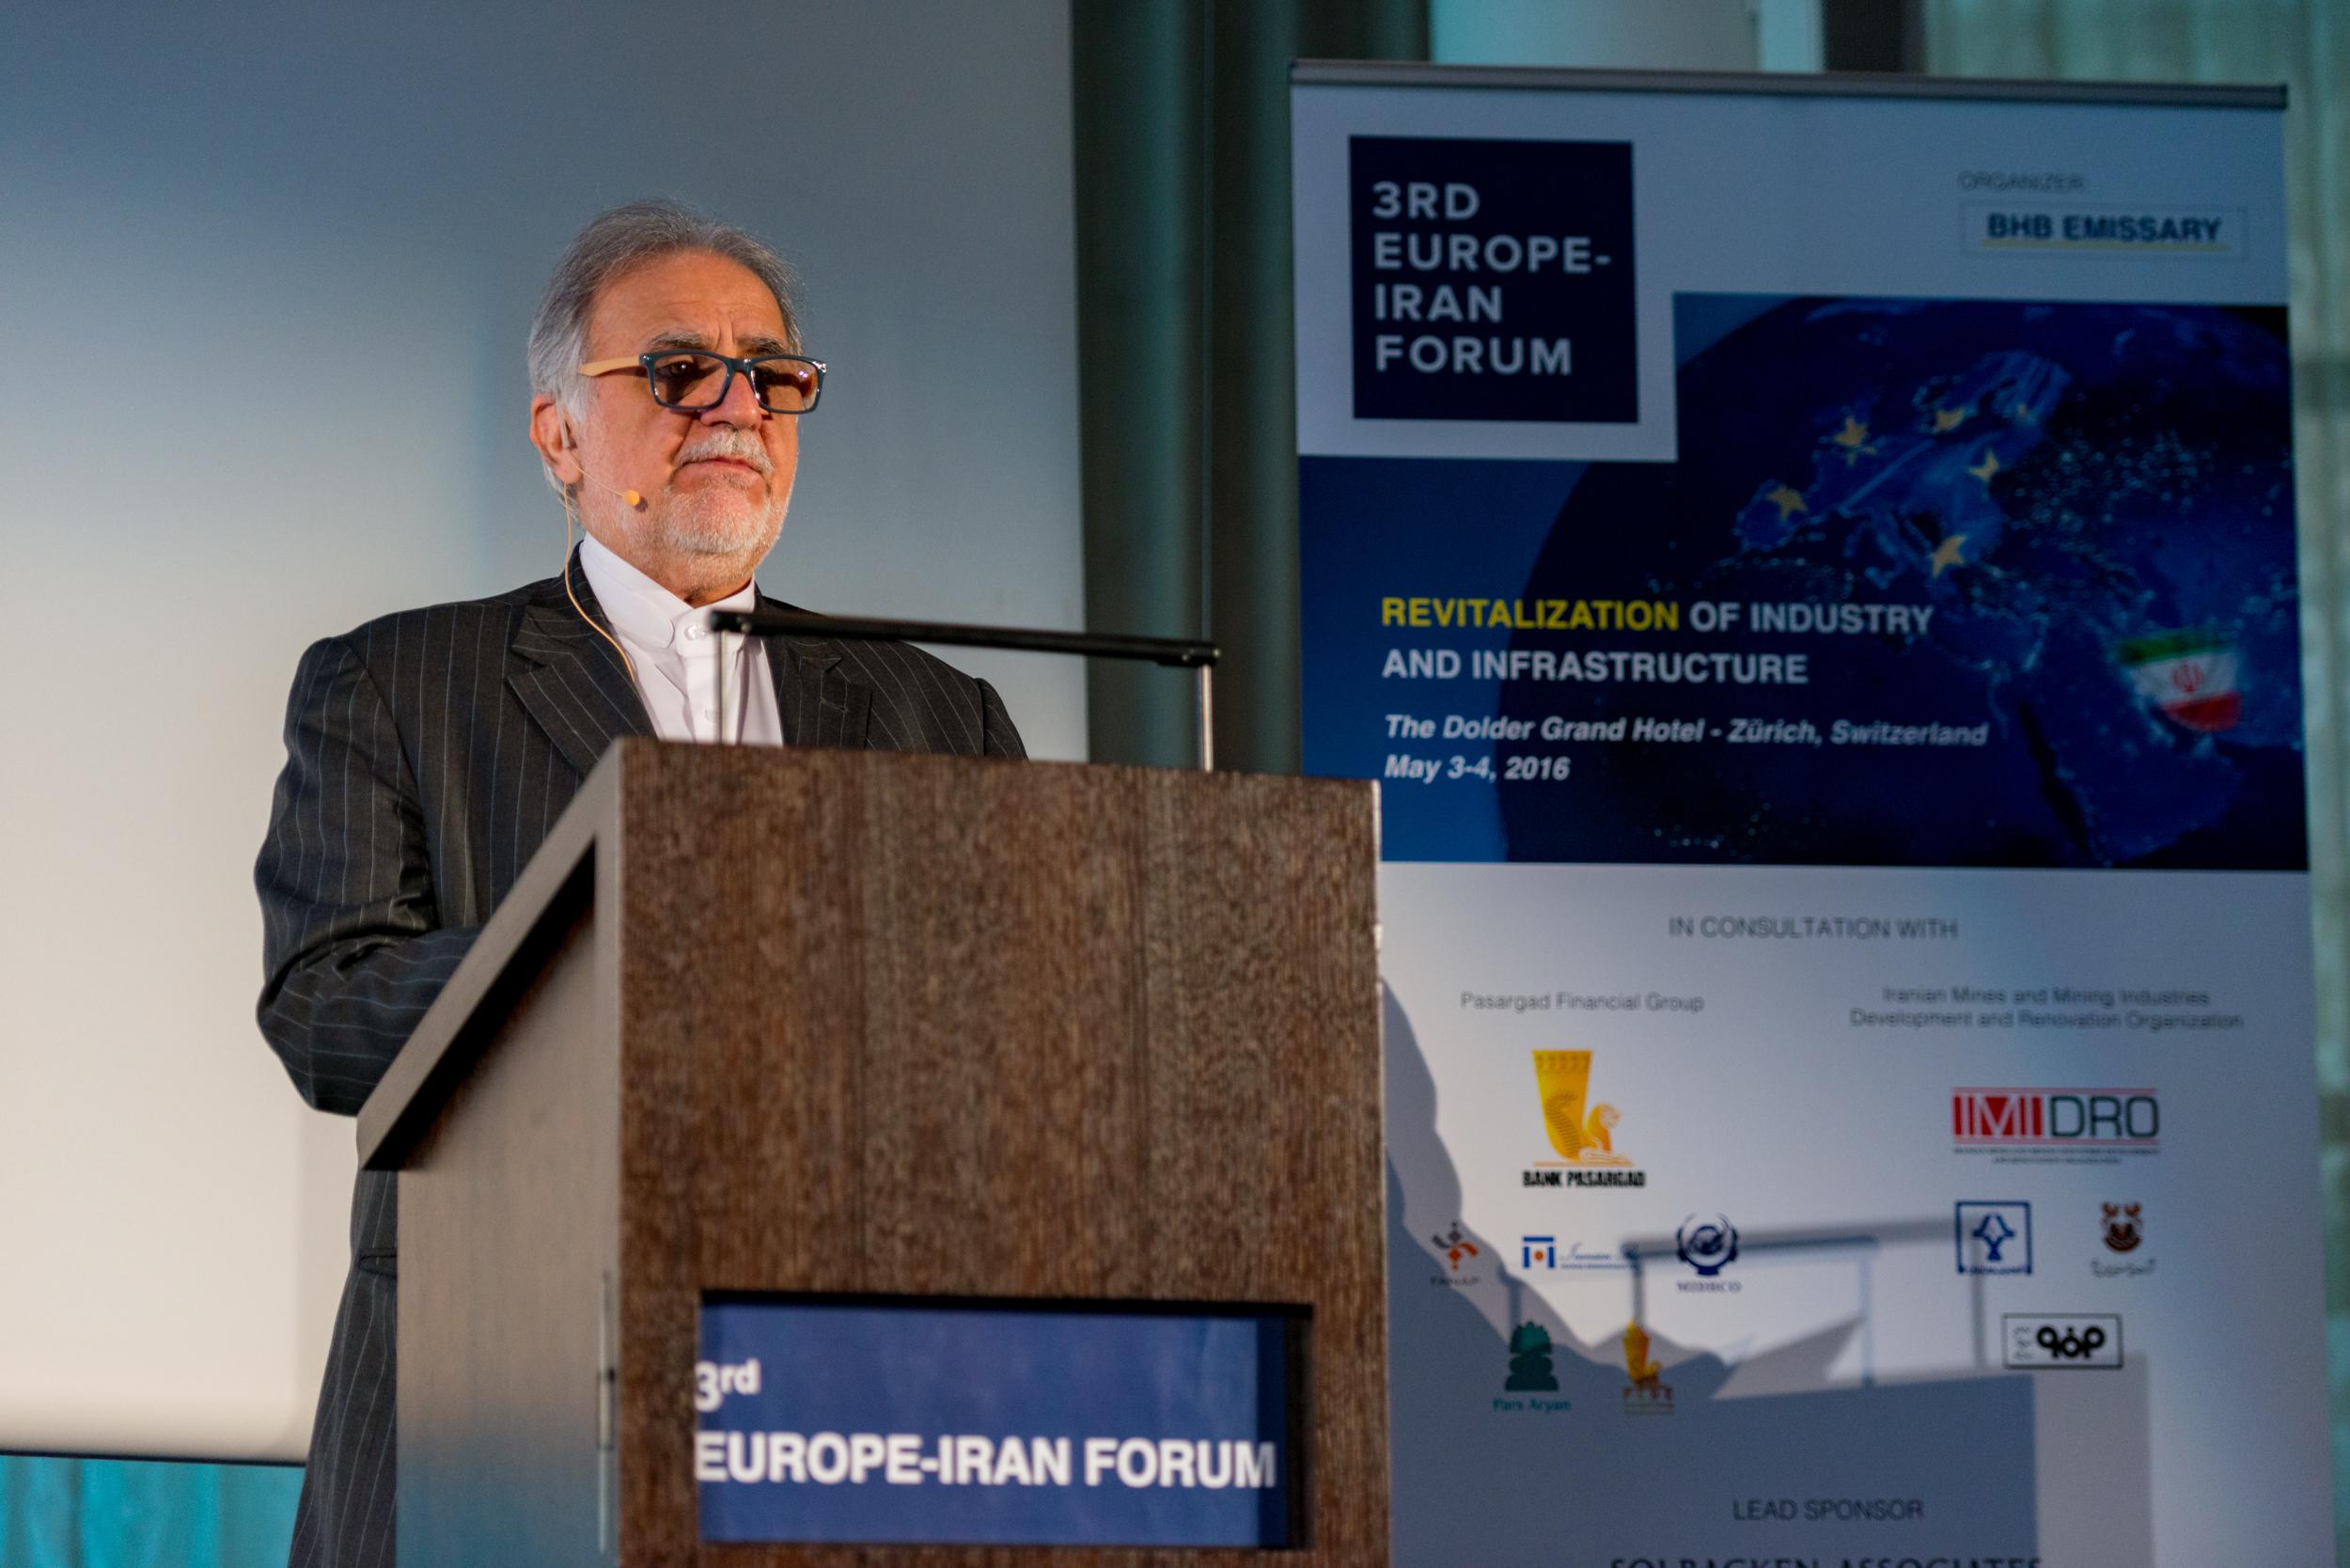 43.3rd Europe-Iran Forum_4.05.2016-Mai16.jpg